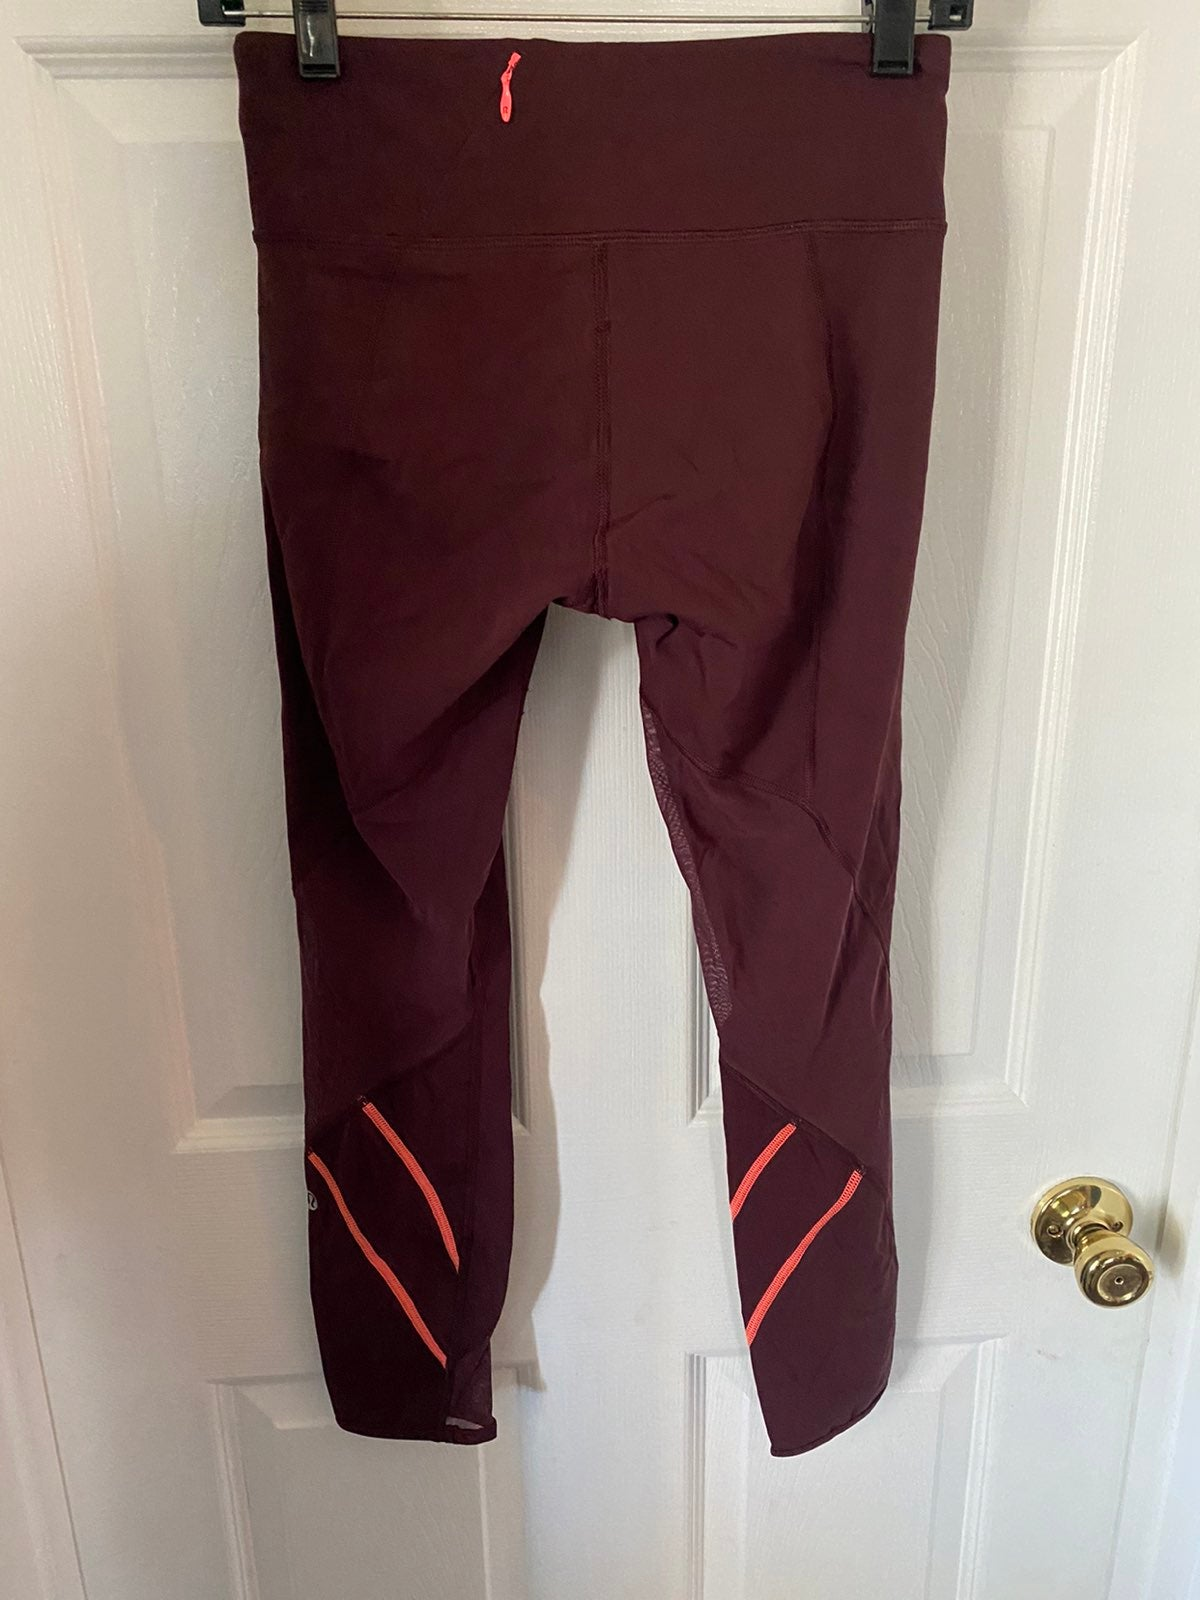 "Lululemon Sz 4 leggings burgundy  23"" in"